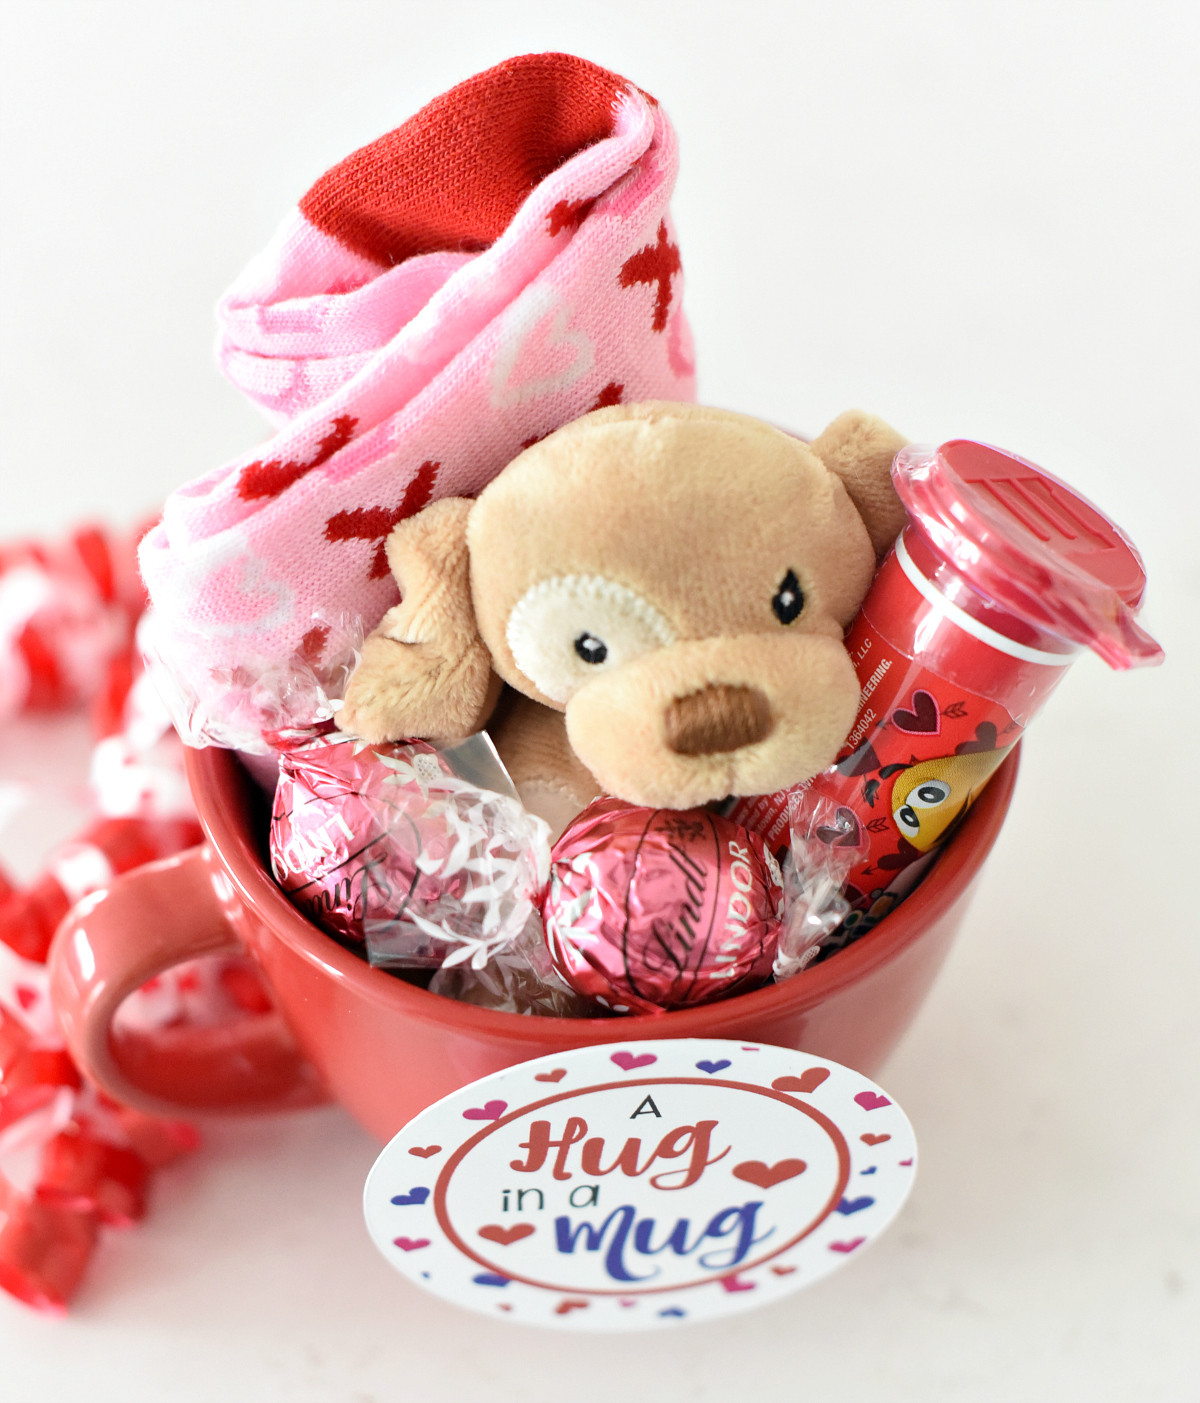 Ideas For Valentine Gift  Fun Valentines Gift Idea for Kids – Fun Squared